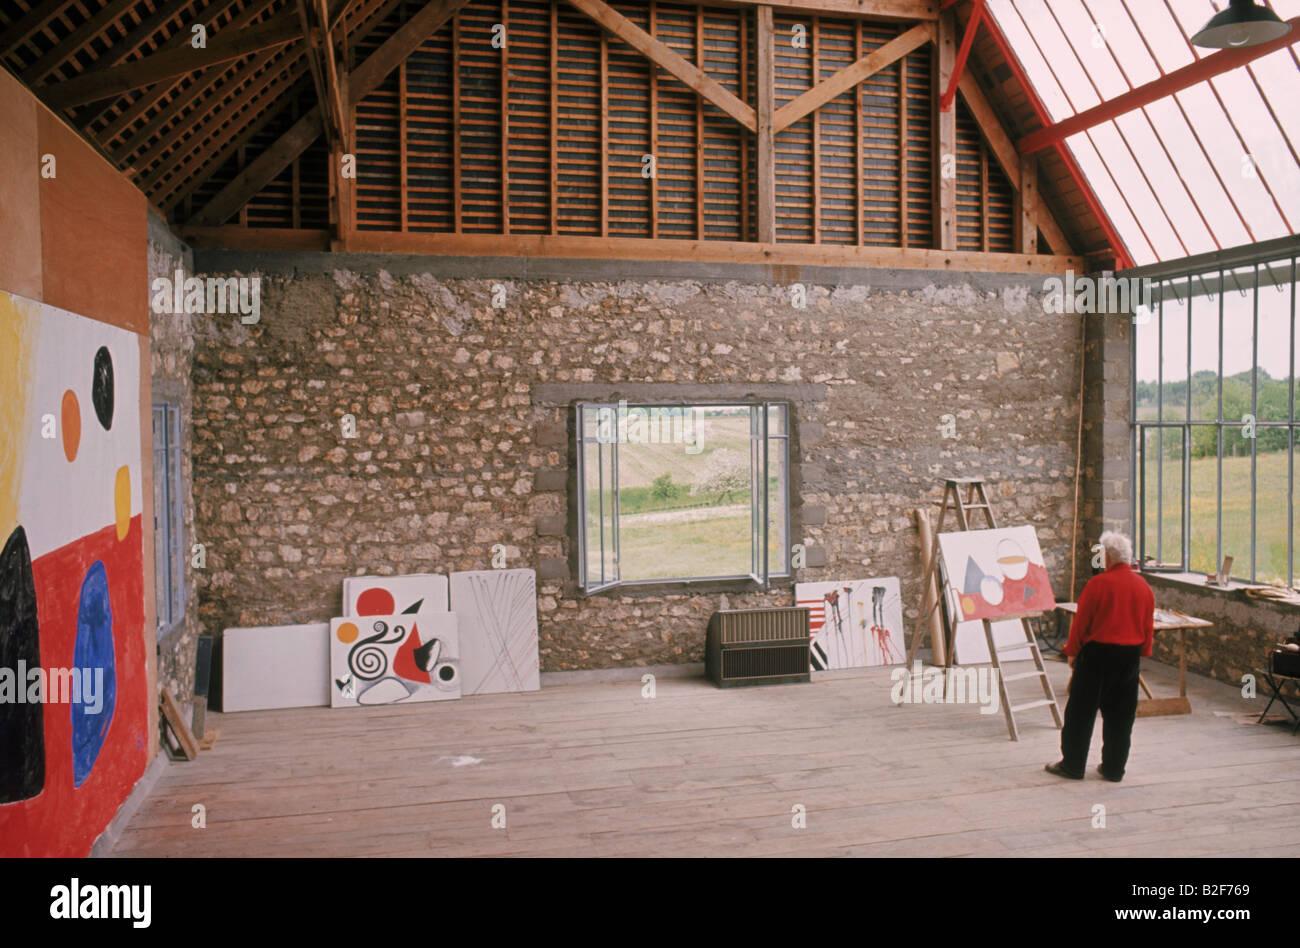 American sculptor and artist Alexander Calder (1898-1976) in his studio in 1973. - Stock Image